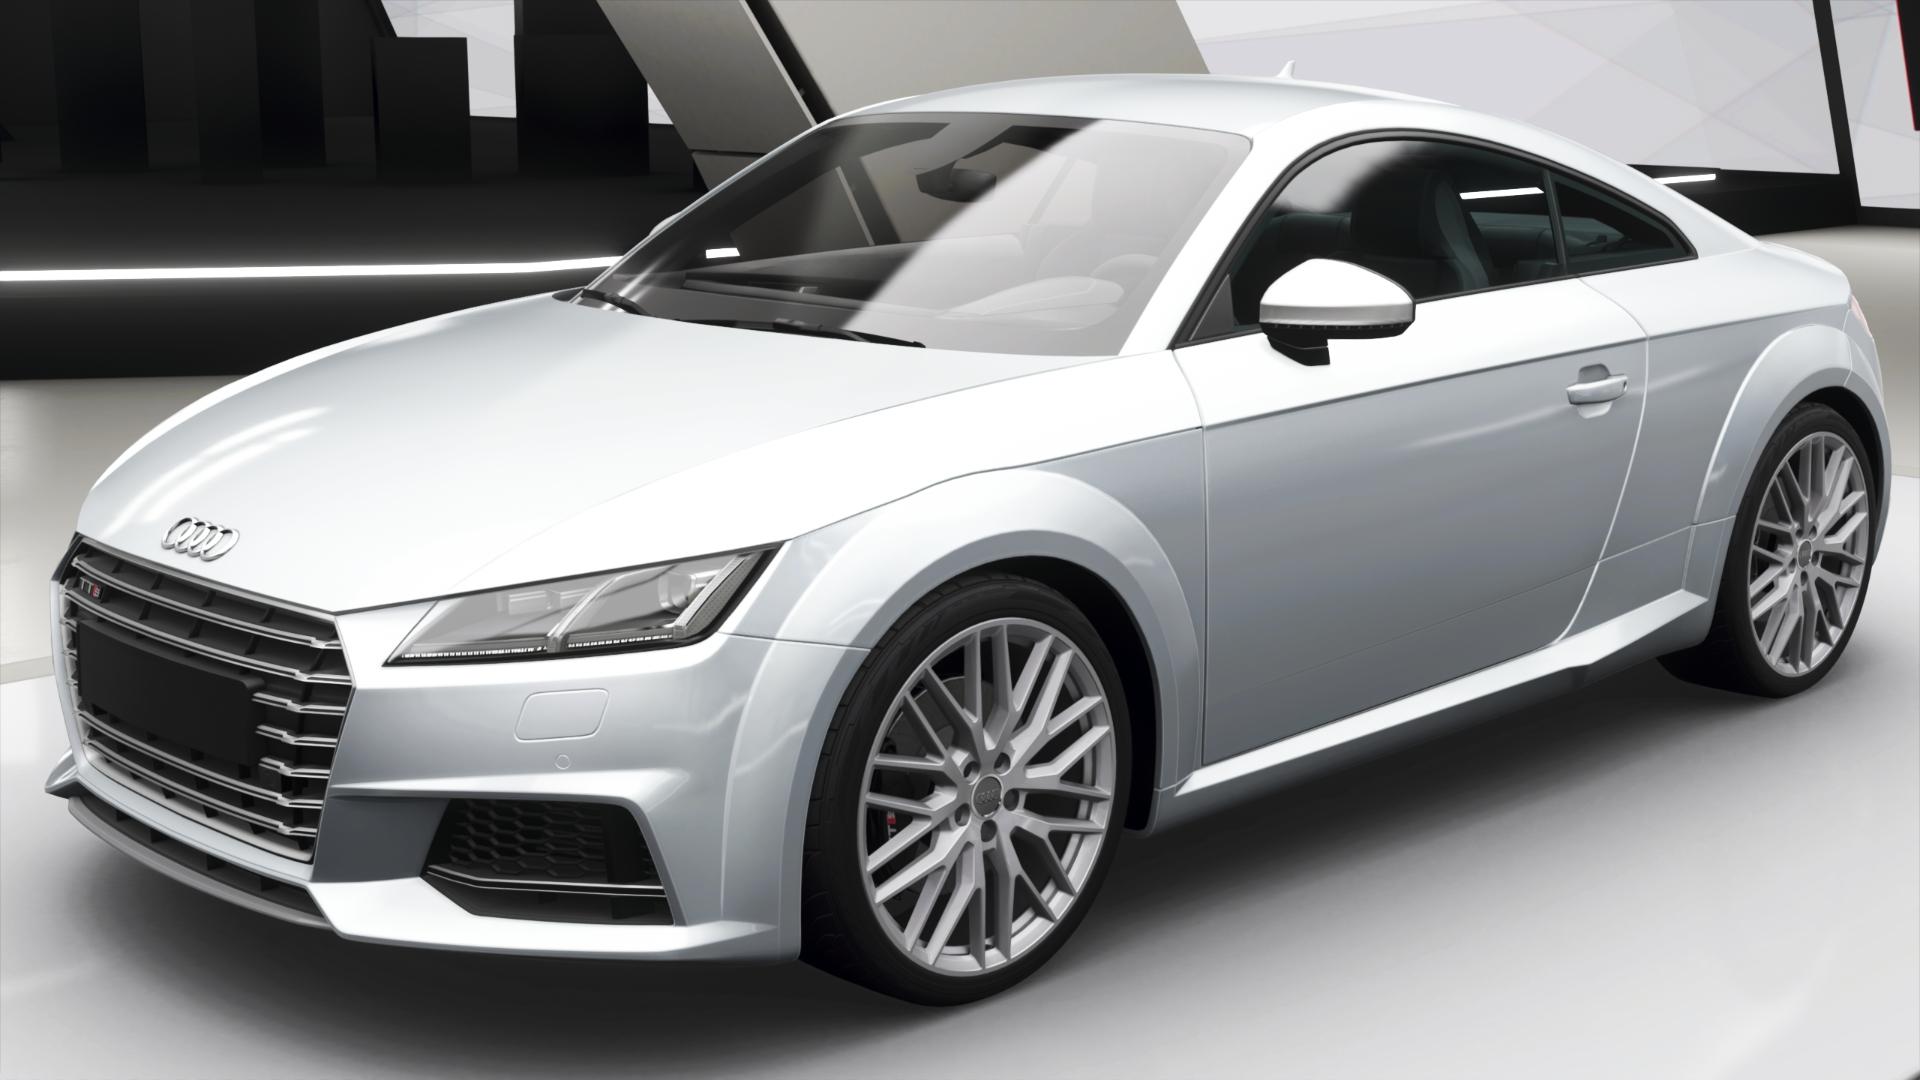 Audi Tts Coupé Forza Motorsport Wiki Fandom Powered By Wikia